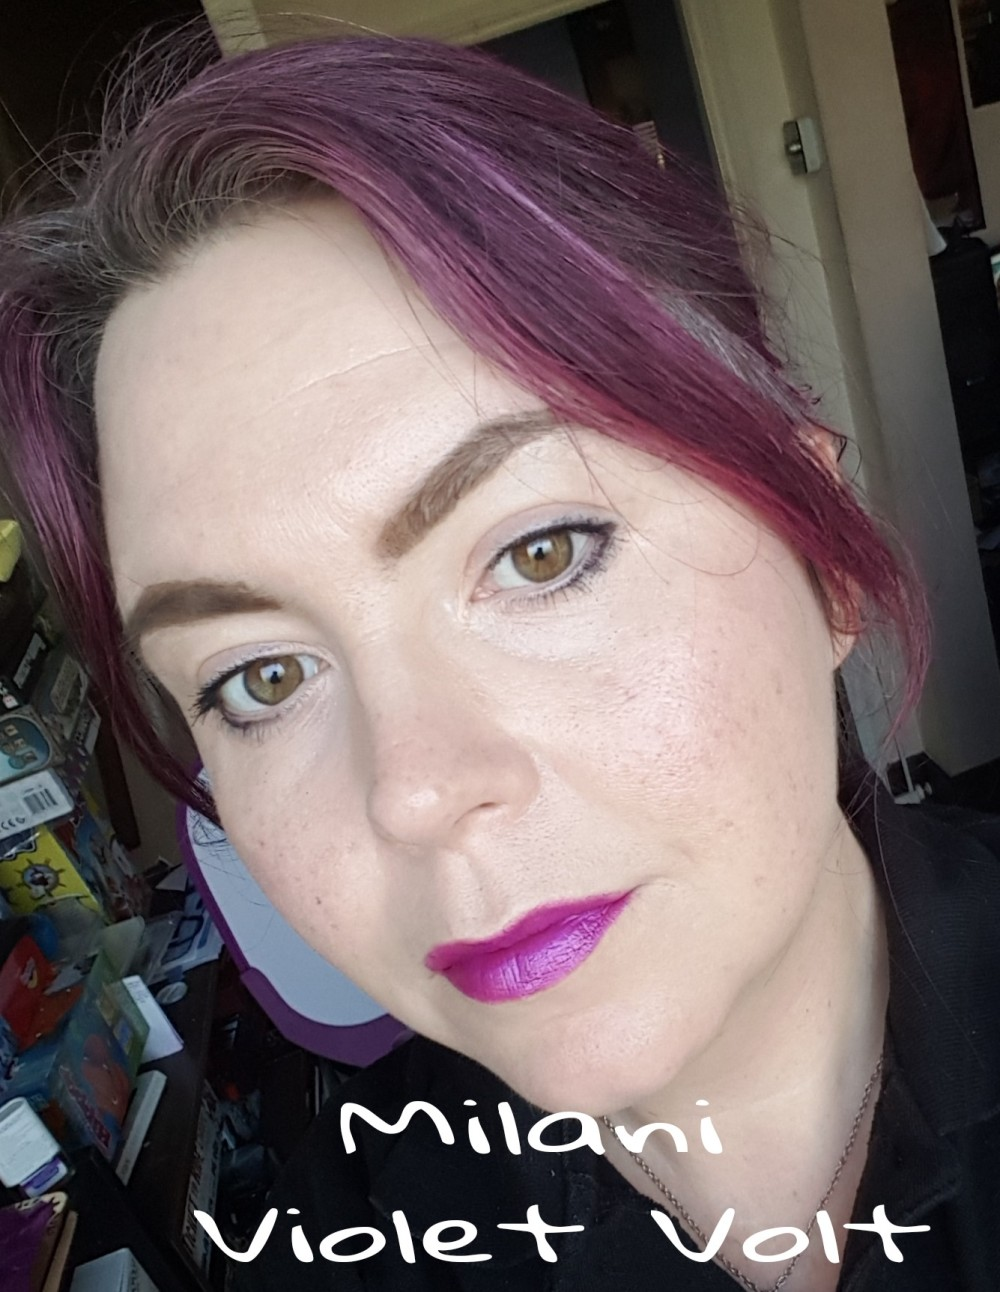 Mailani Violet Volt